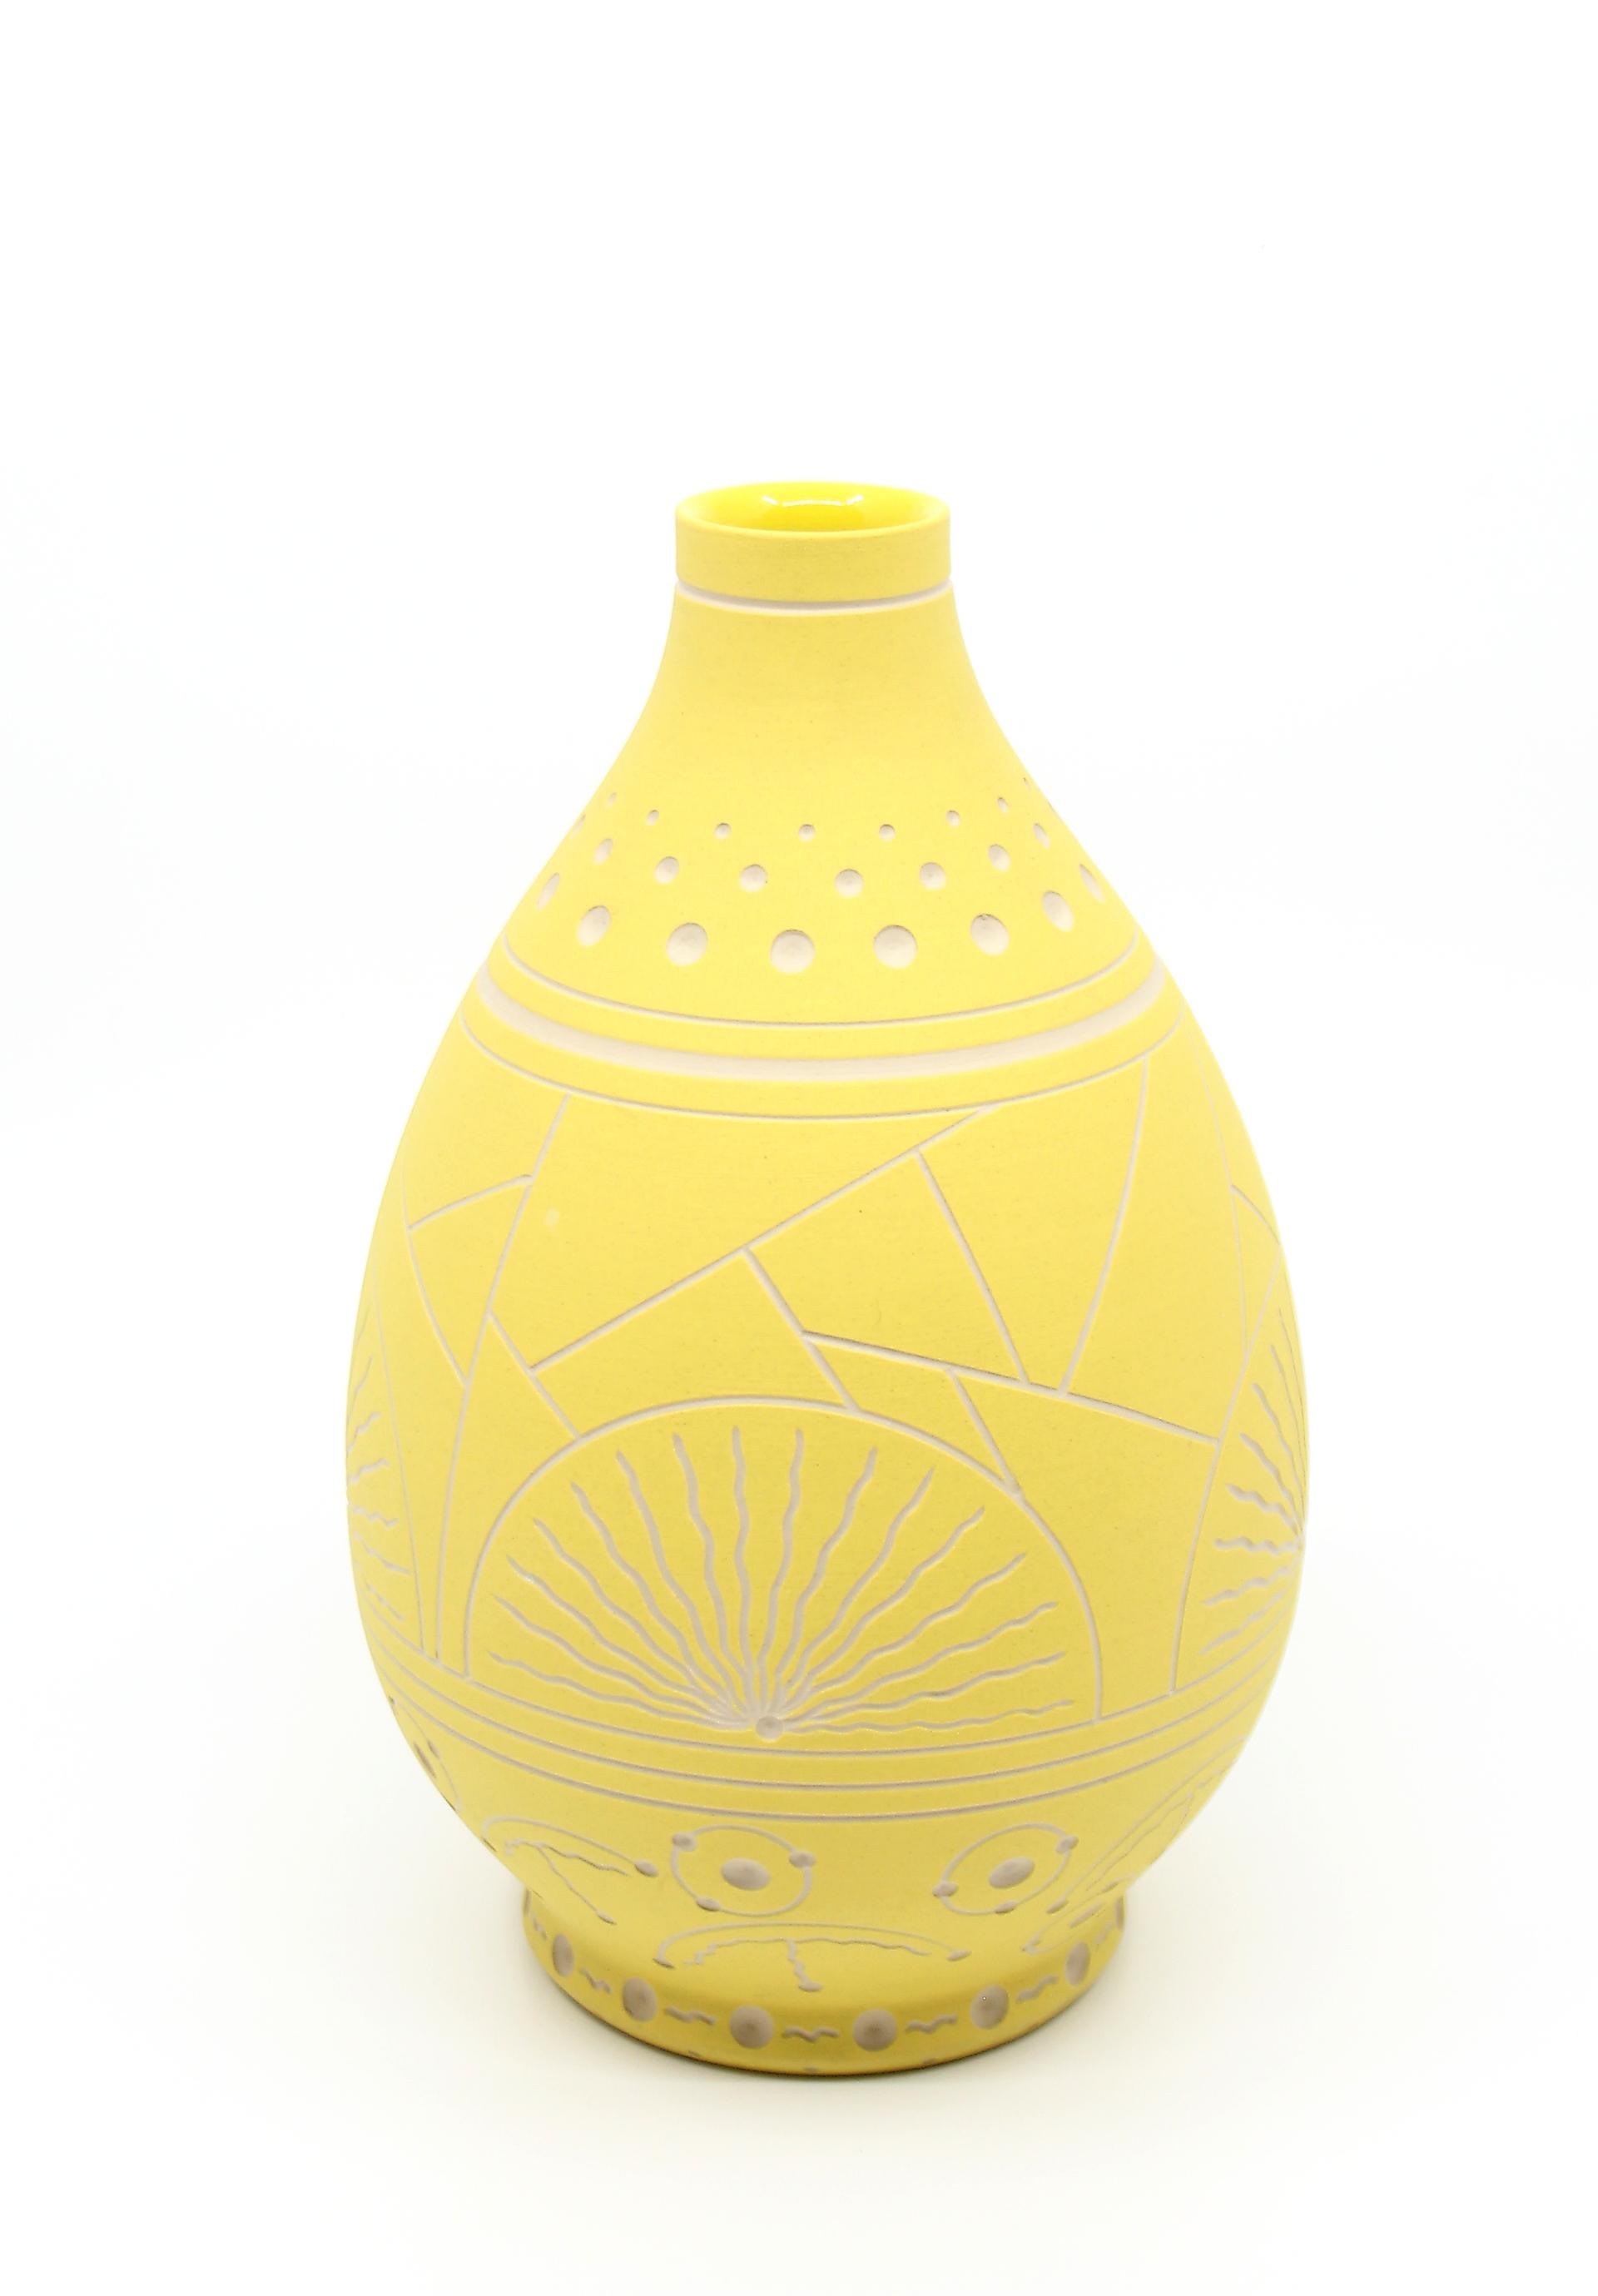 Yellow Teardrop Vase by Chris Casey